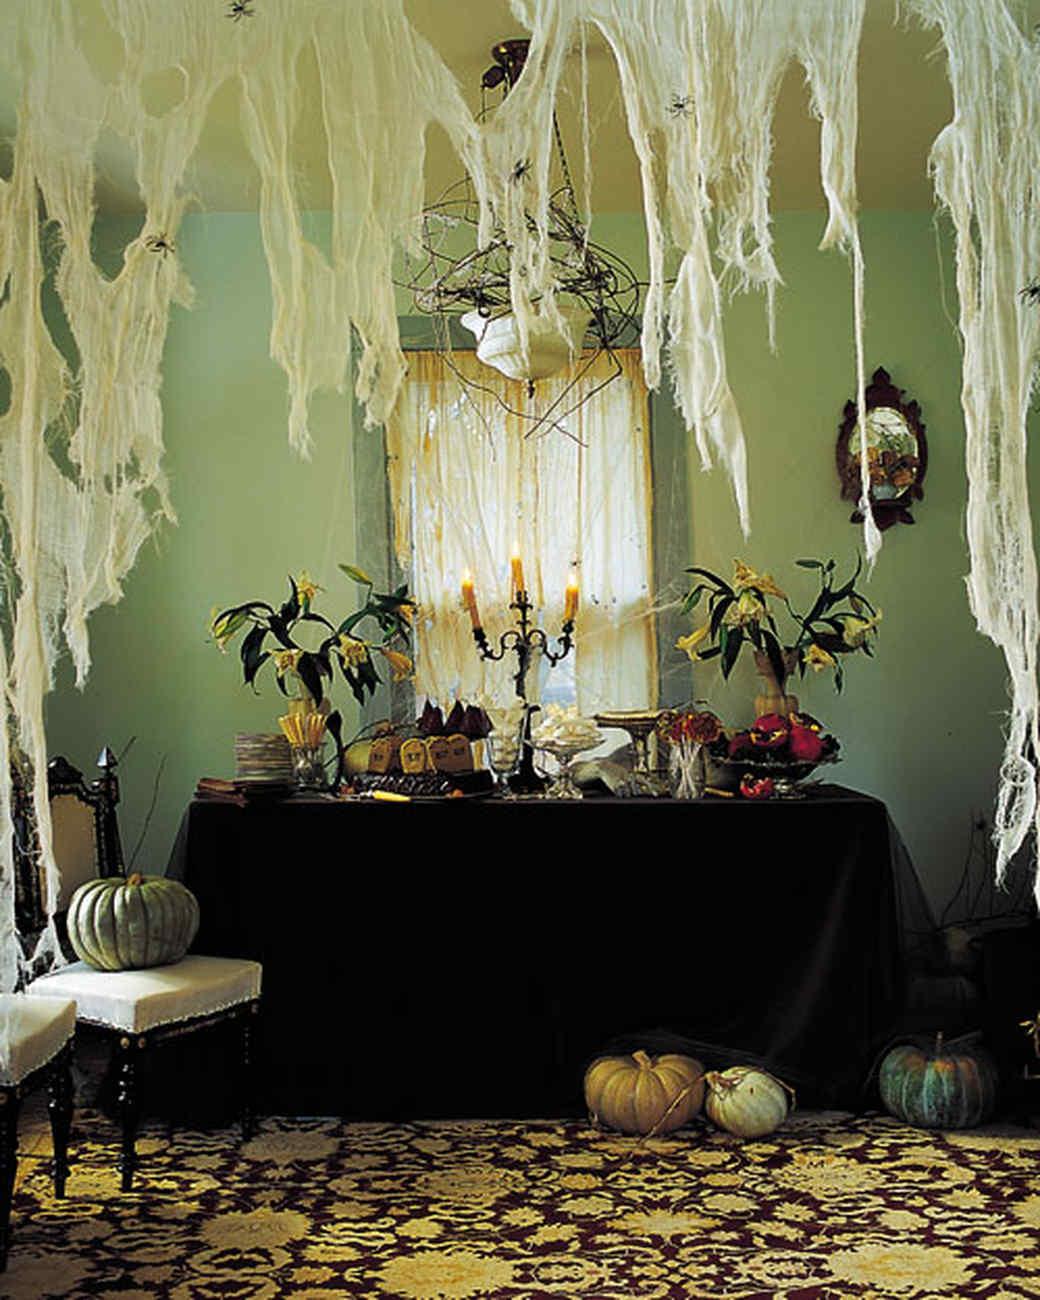 Moth-Eaten Curtains